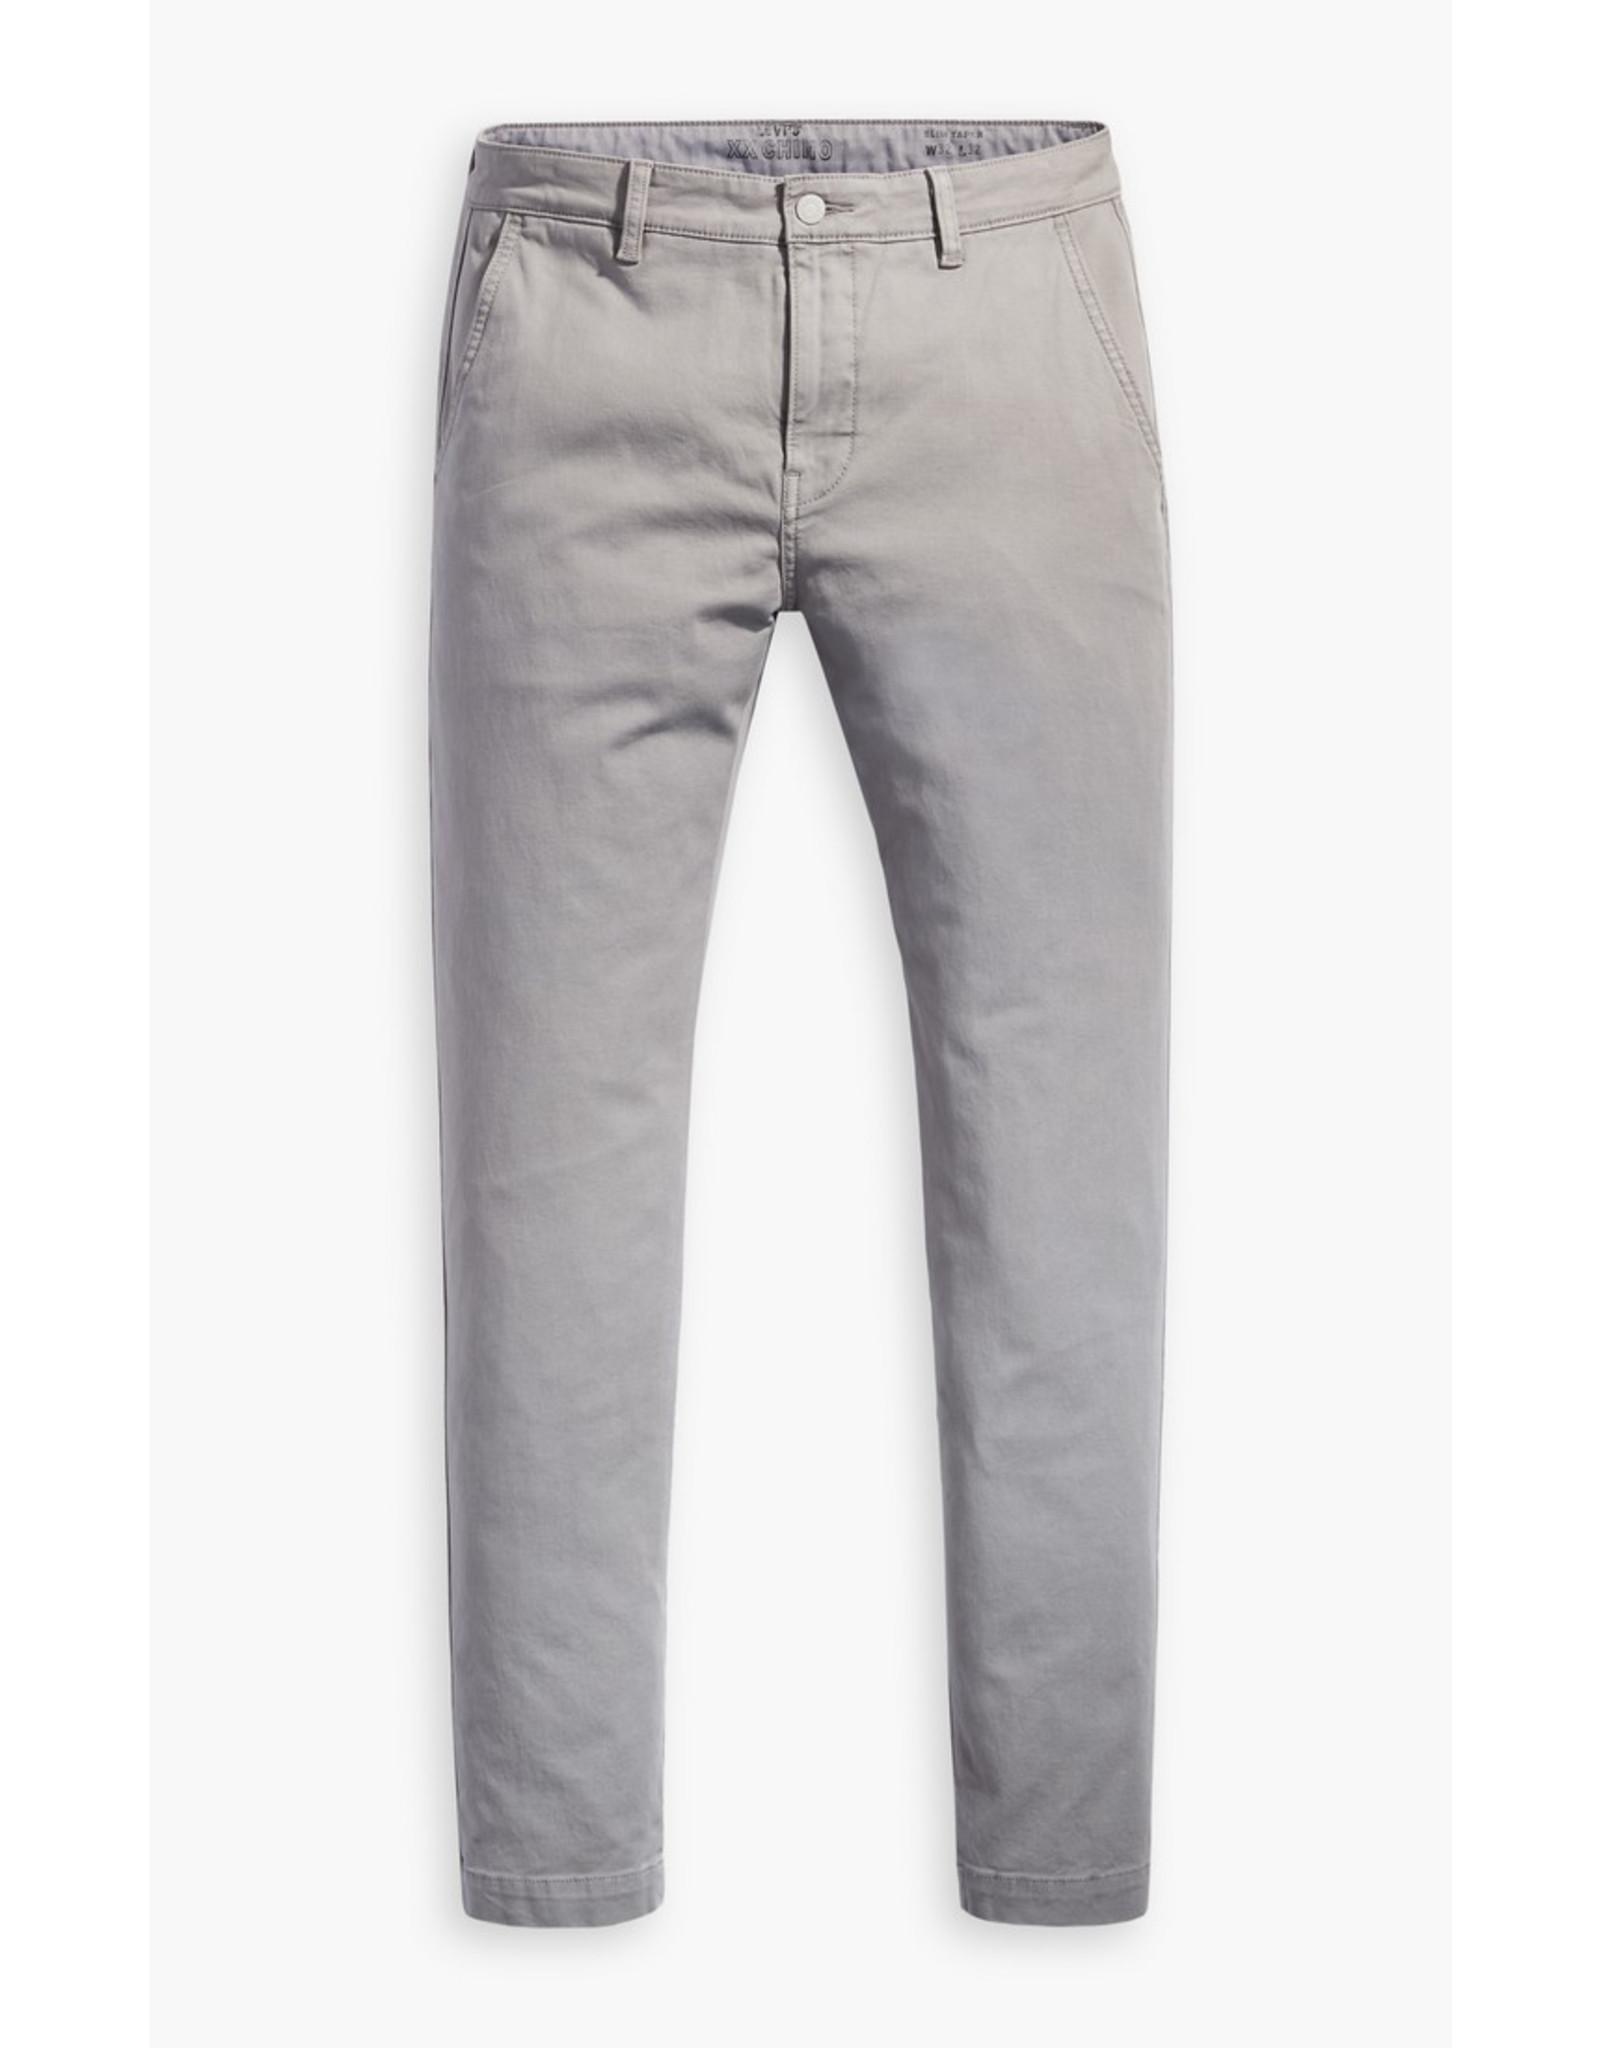 Levi's Levi's XX Chino Pants/ Slim Taper